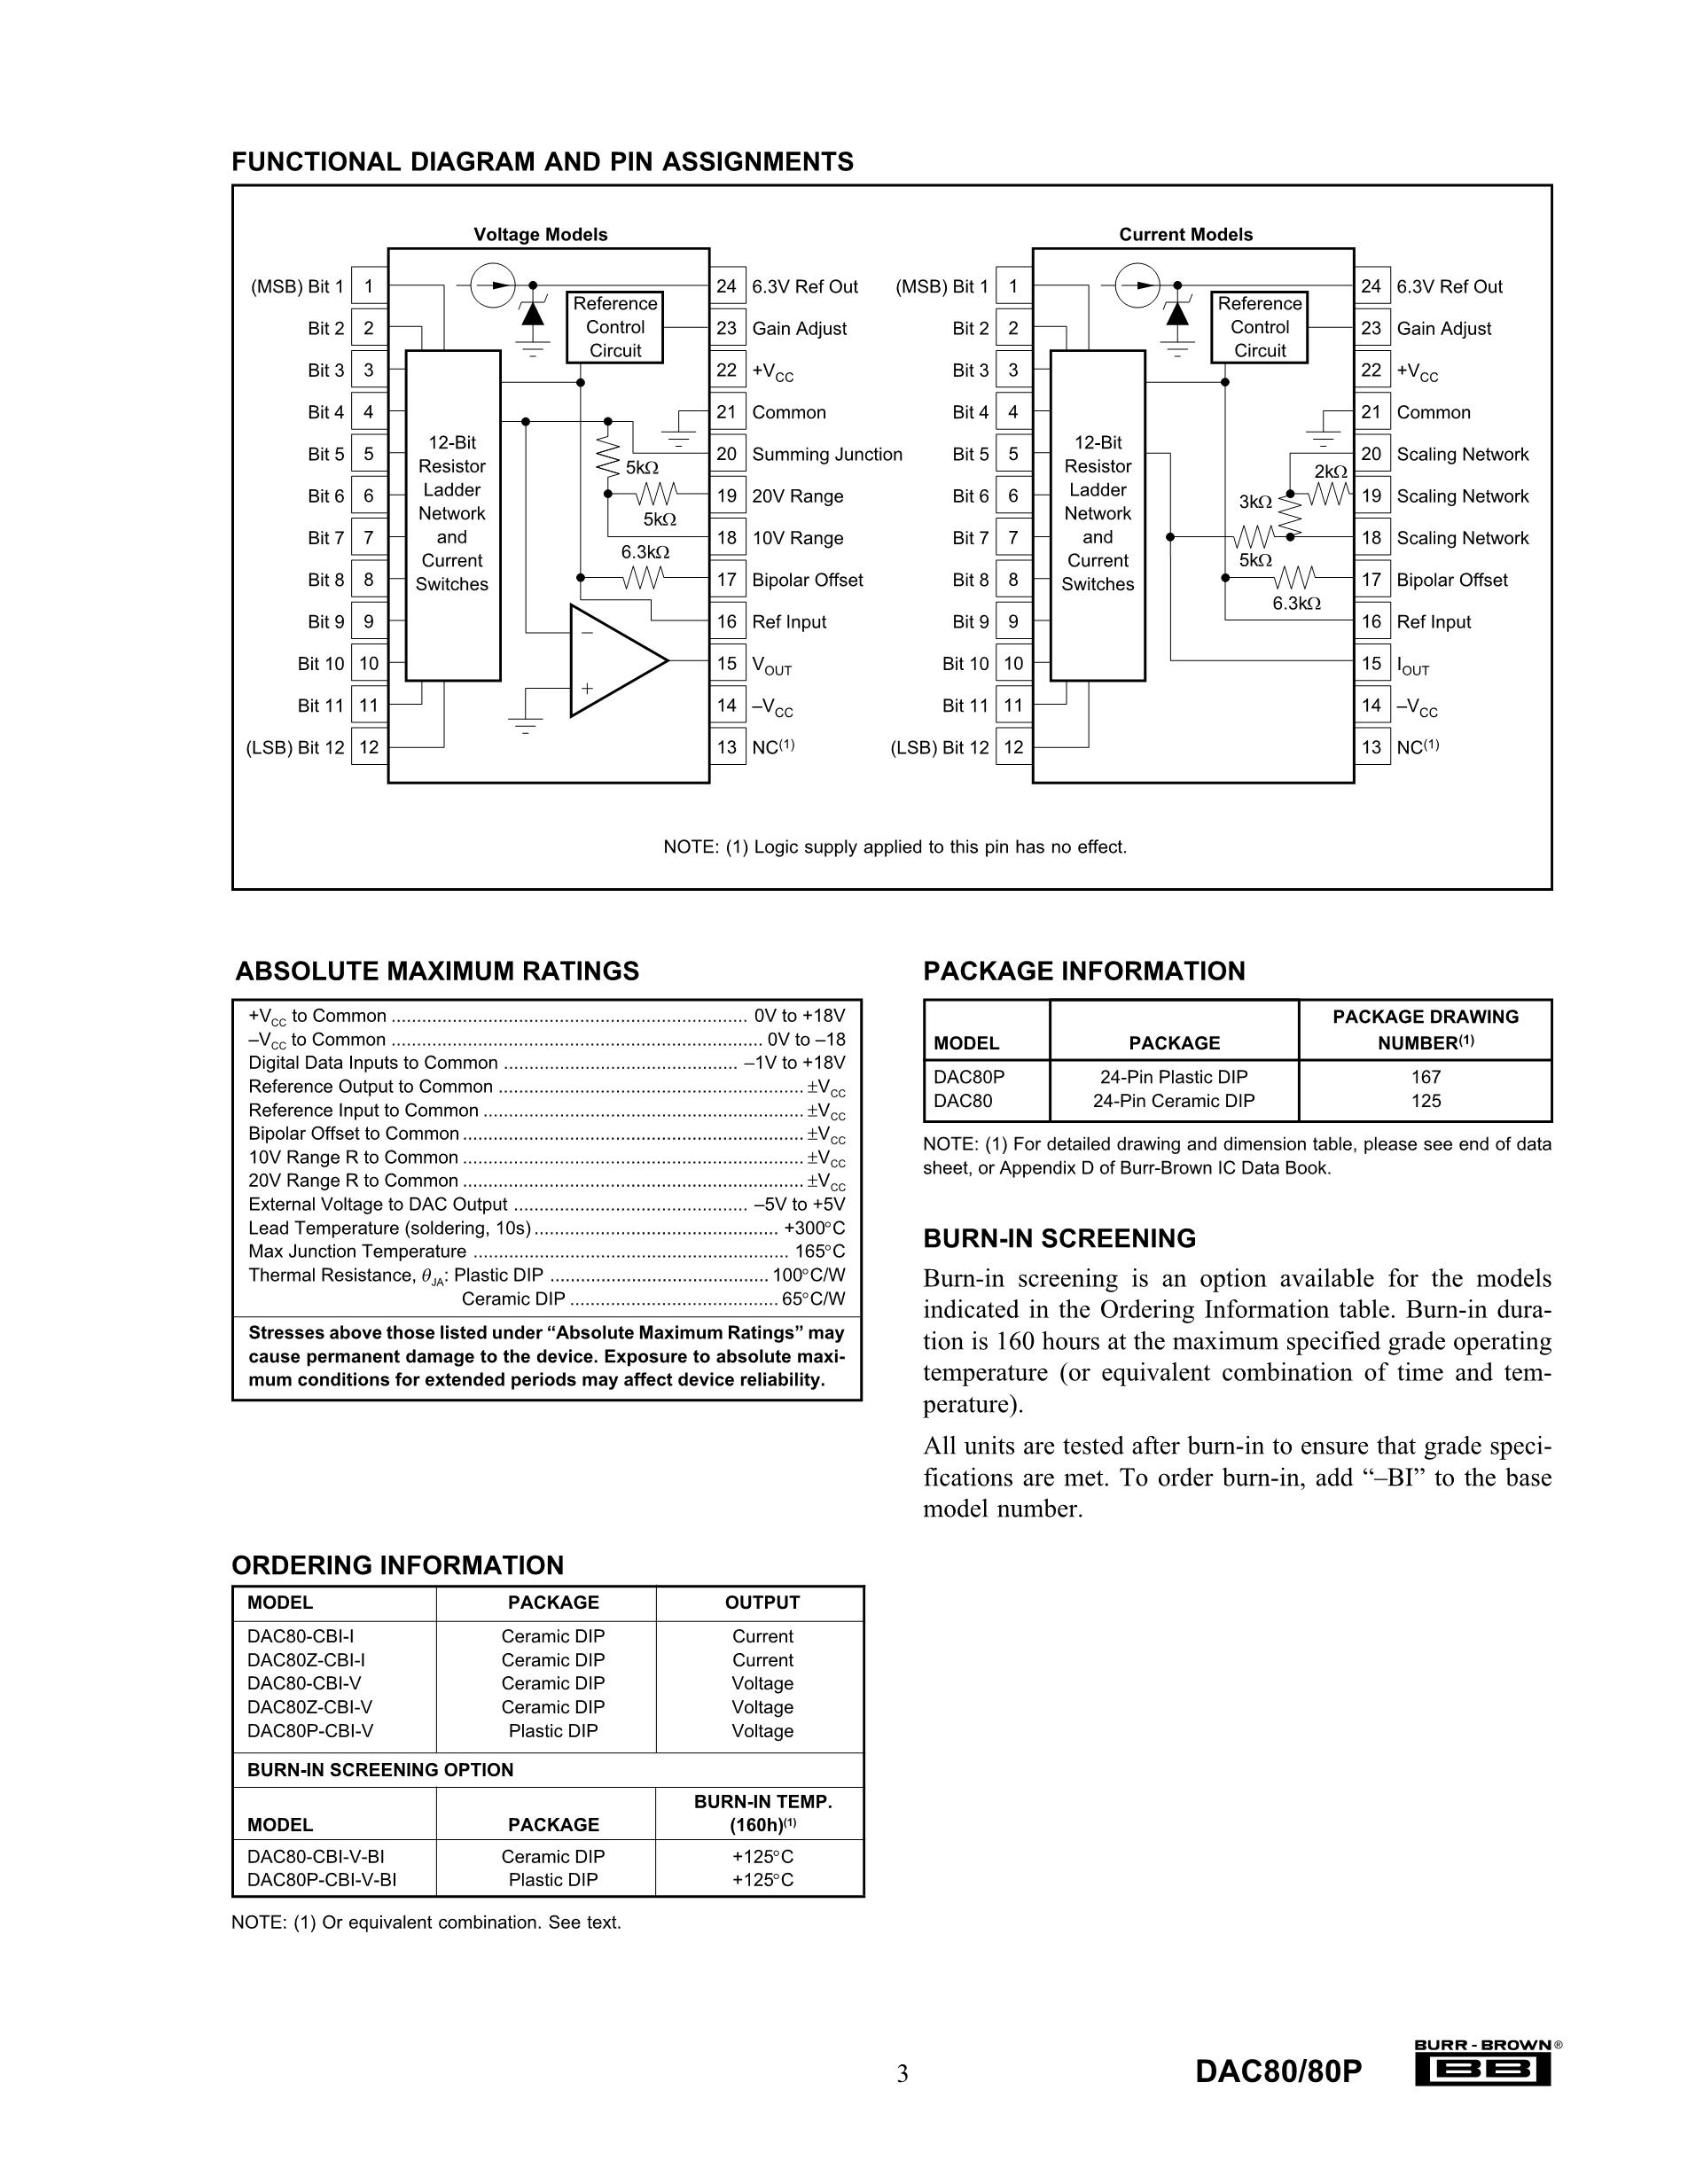 DAC8742HPBS's pdf picture 3